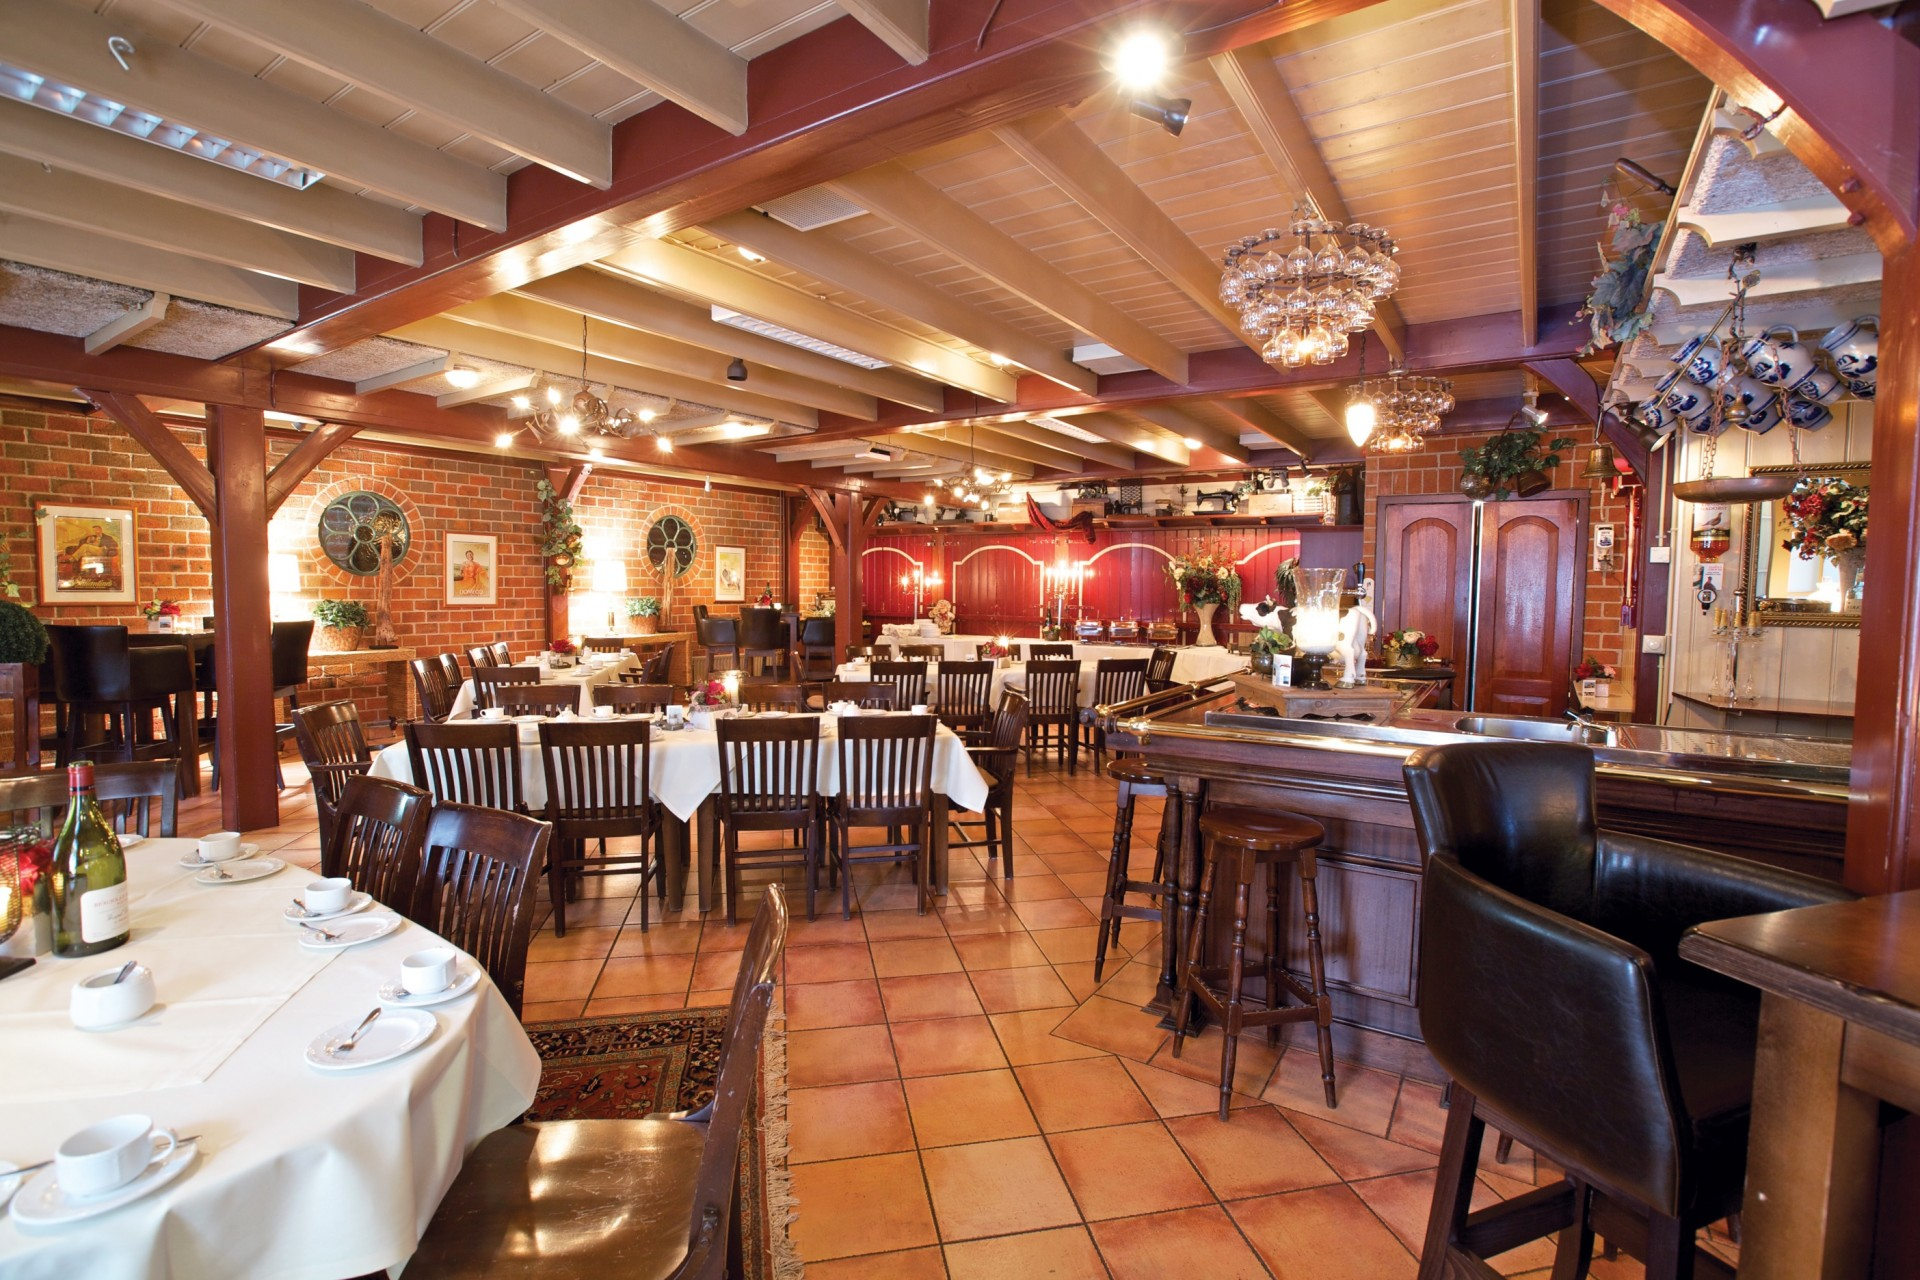 Nadorst-restaurant-uitspanning-faciliteiten-pronckkamer-1